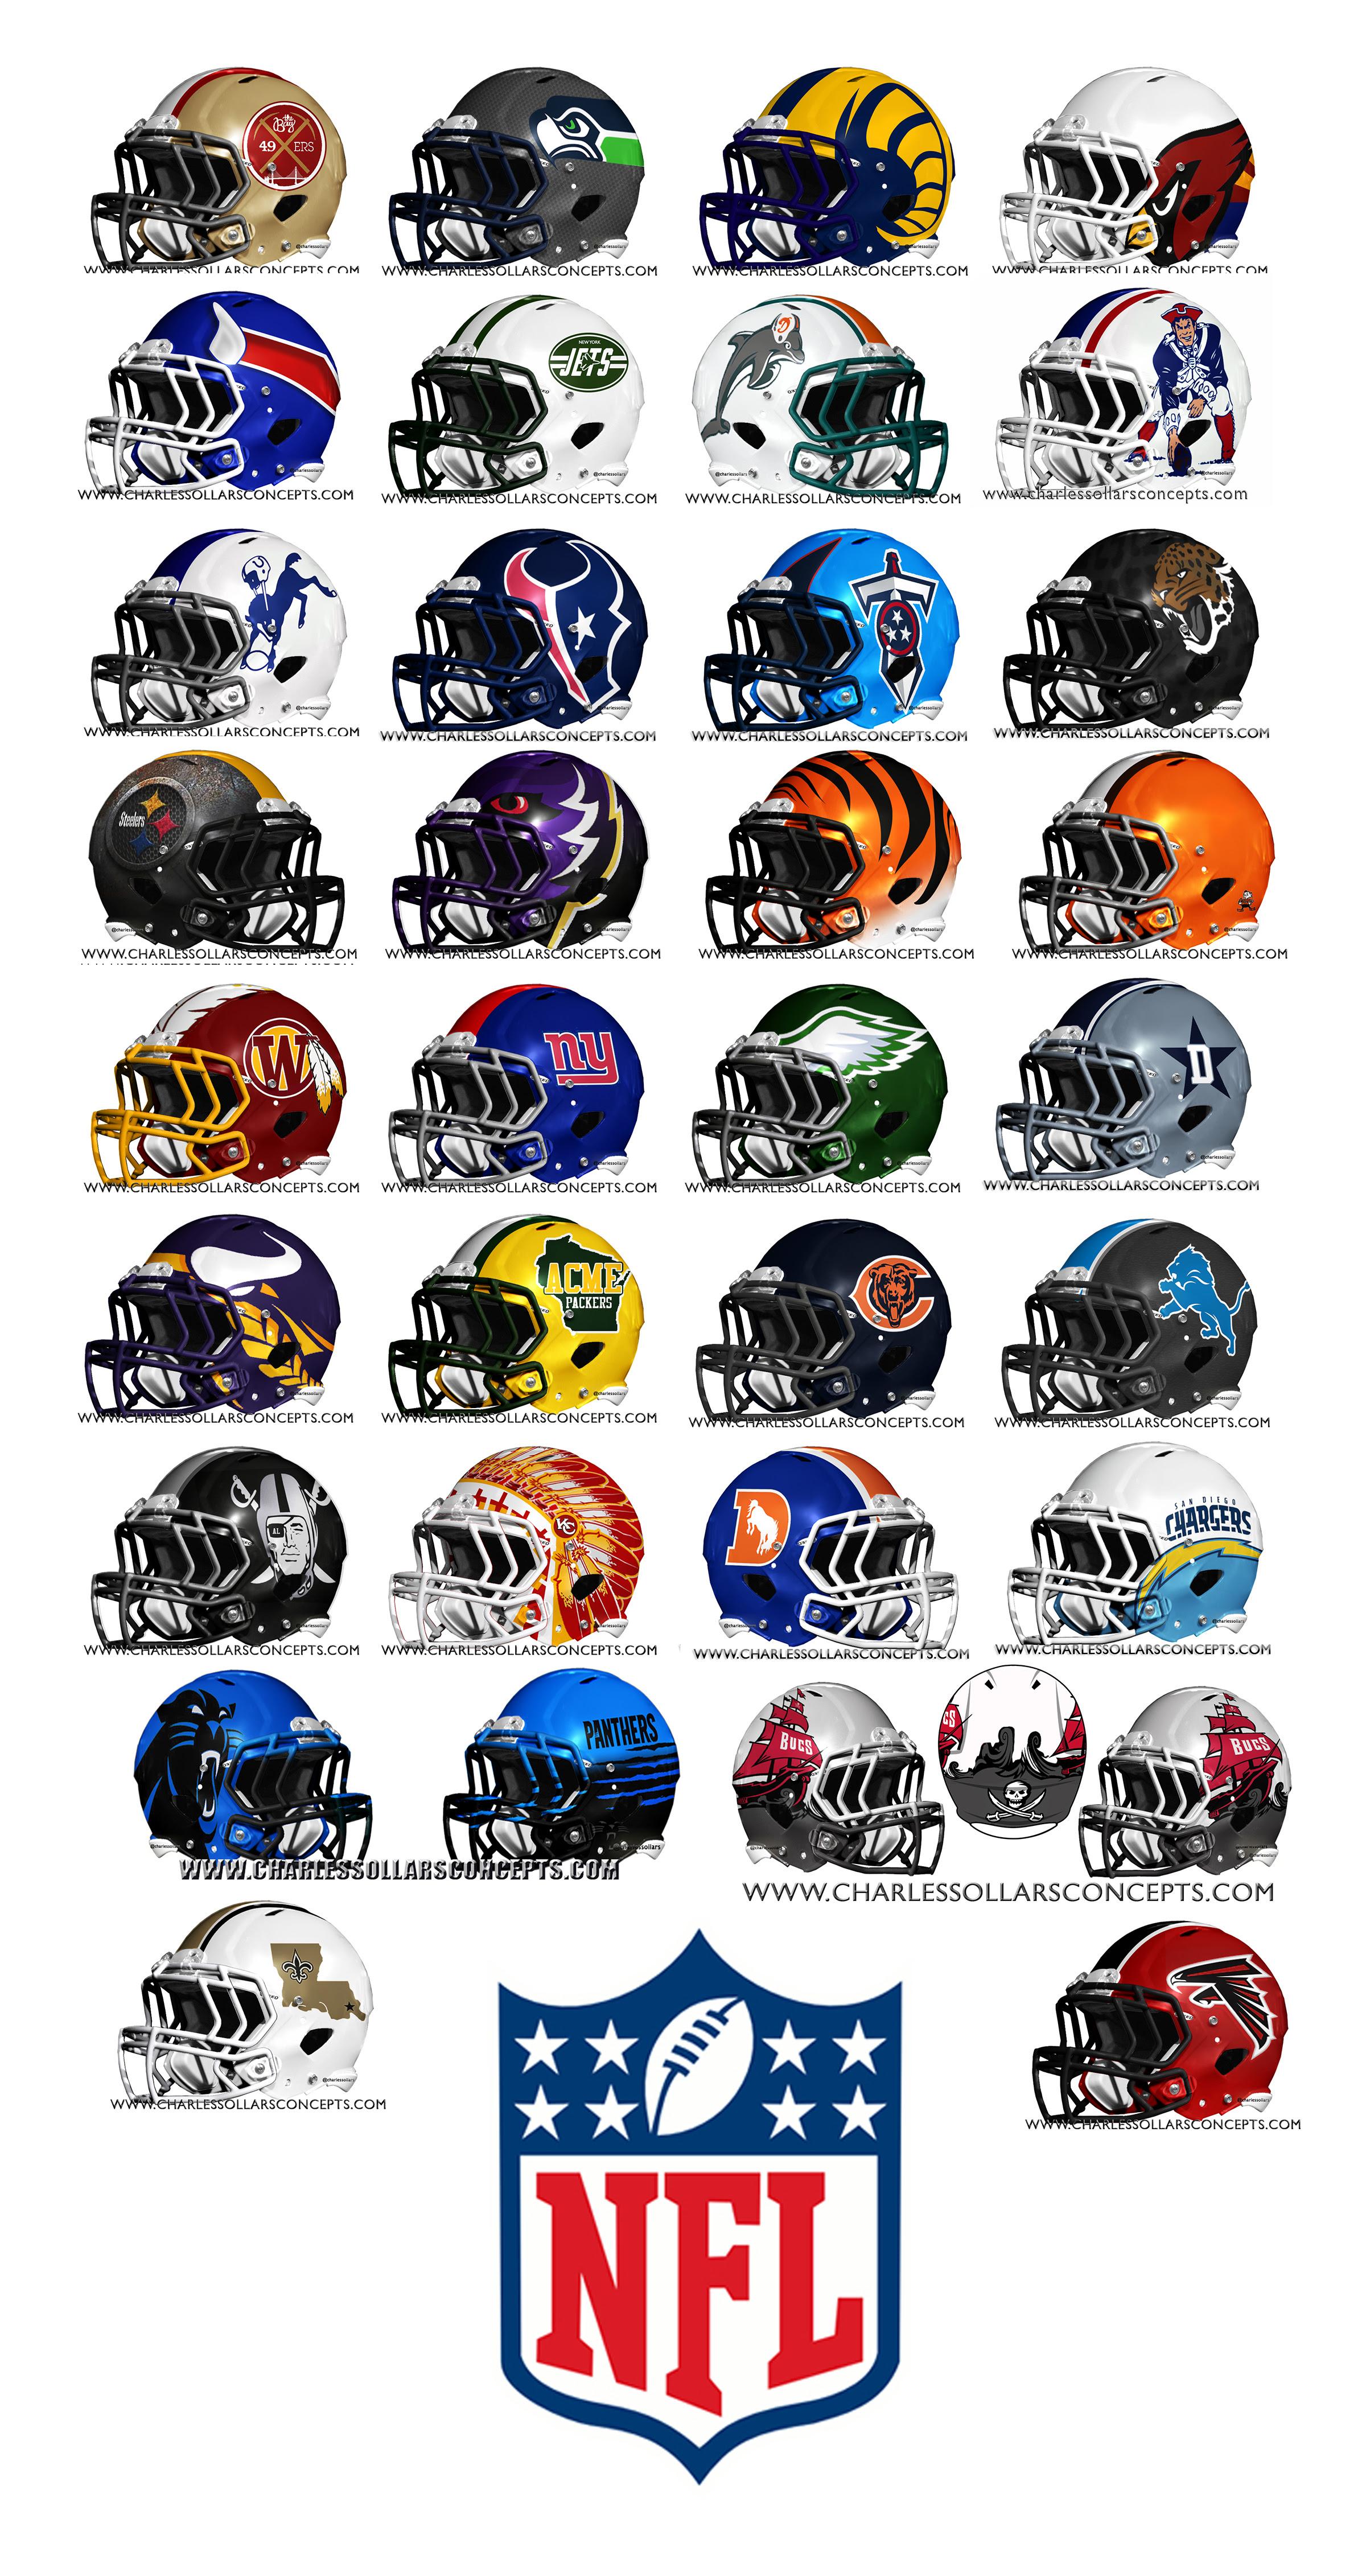 NFL Helmet Redesign All 32 Teams - Concepts - Chris Creamer's Sports Logos Community - CCSLC ...